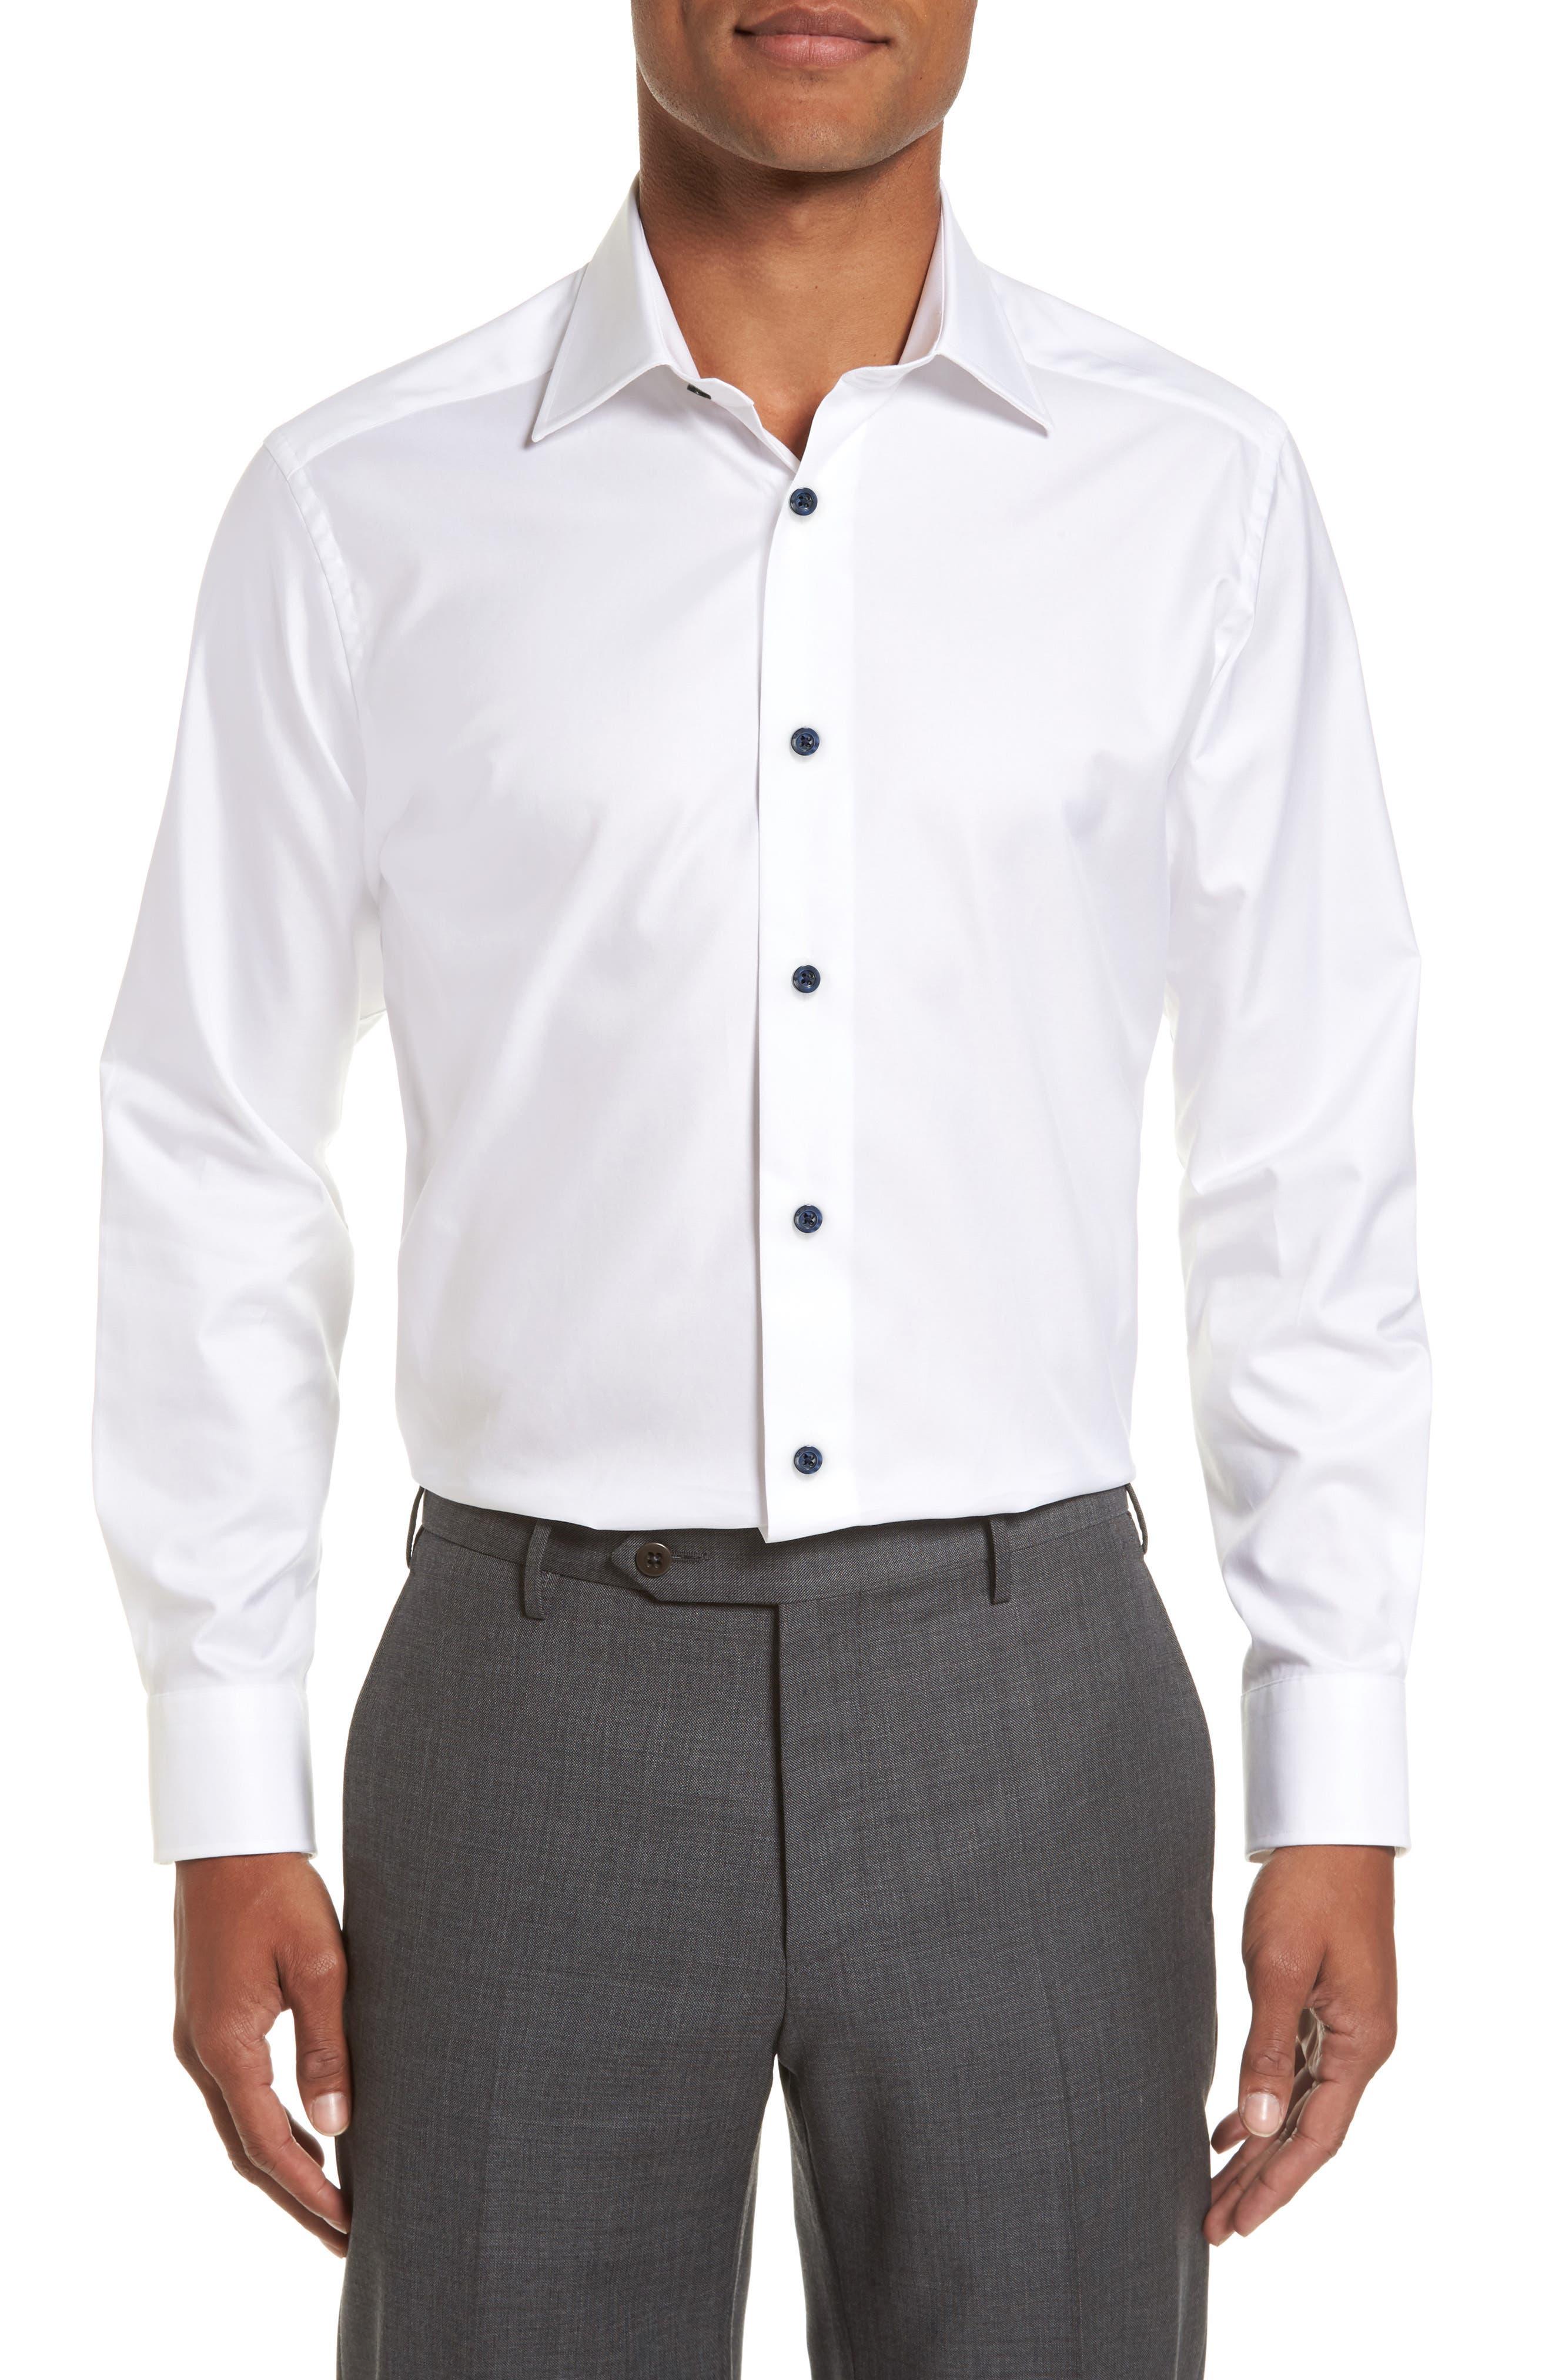 Main Image - David Donahue Slim Fit Solid Dress Shirt